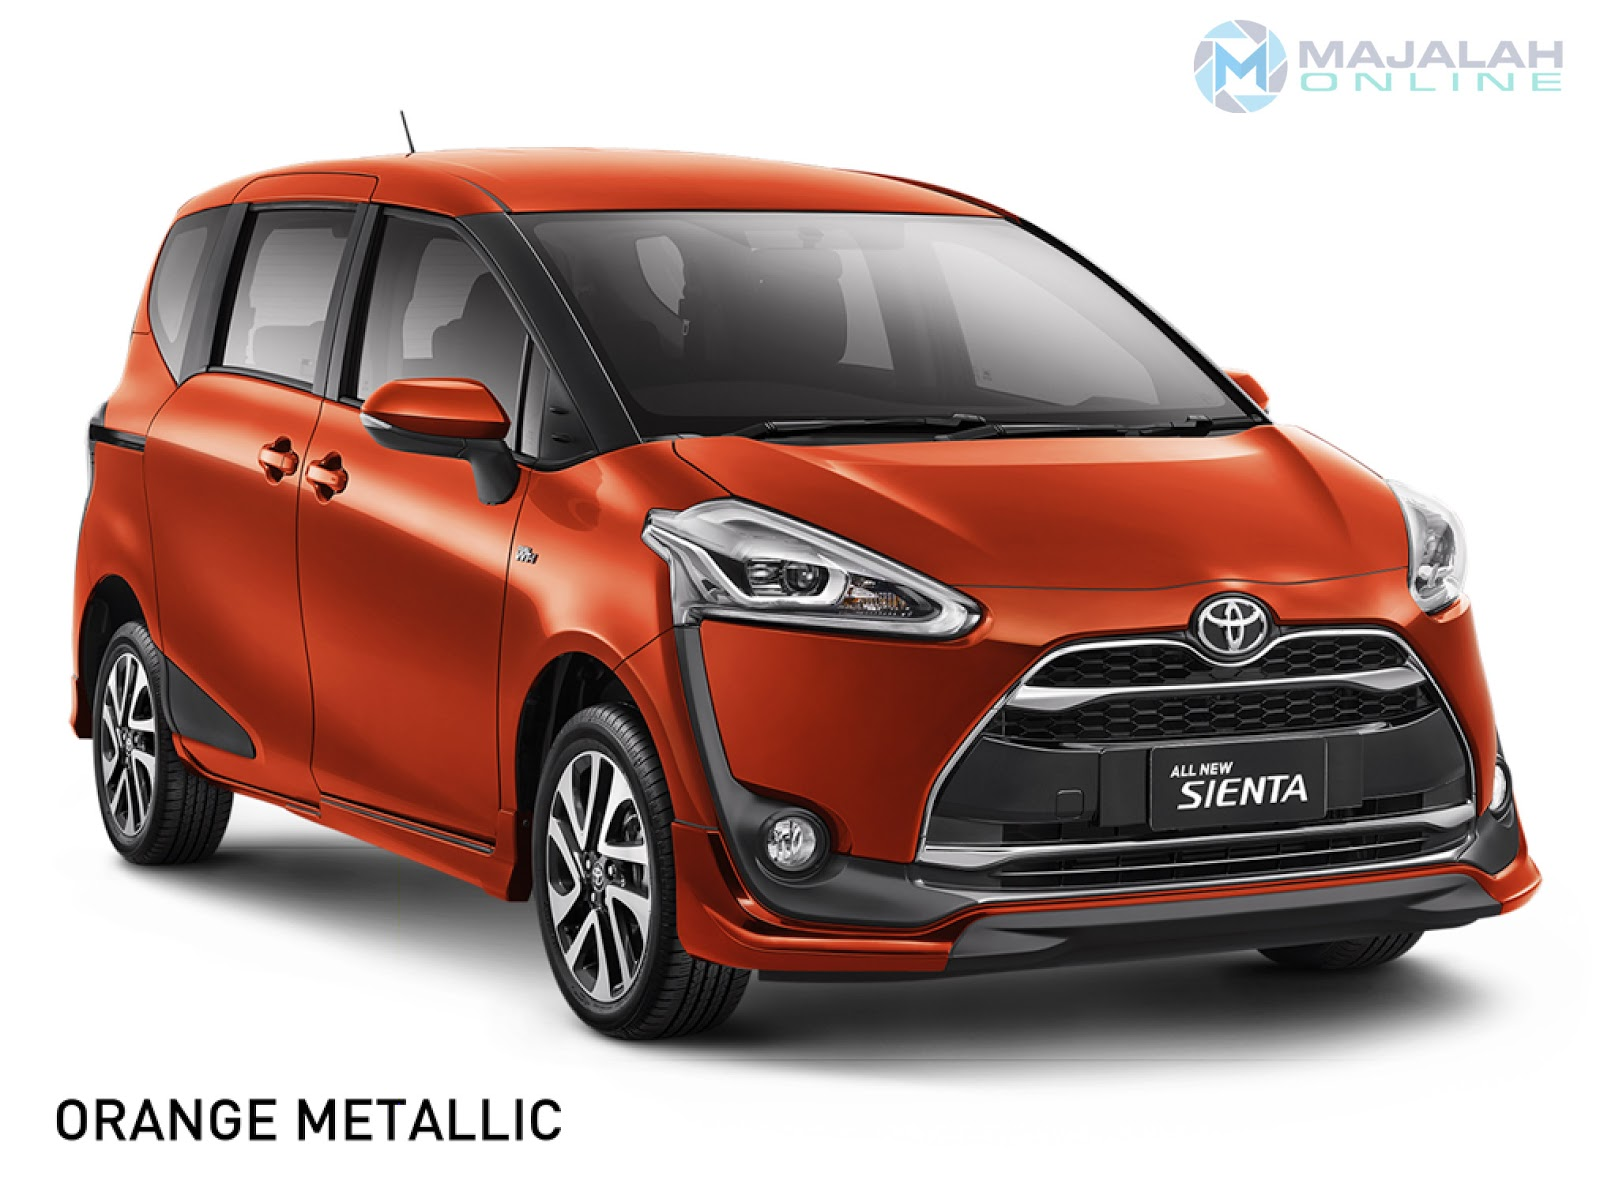 Warna Toyota Sienta 2017 - Harga Toyota Calya Agya Avanza